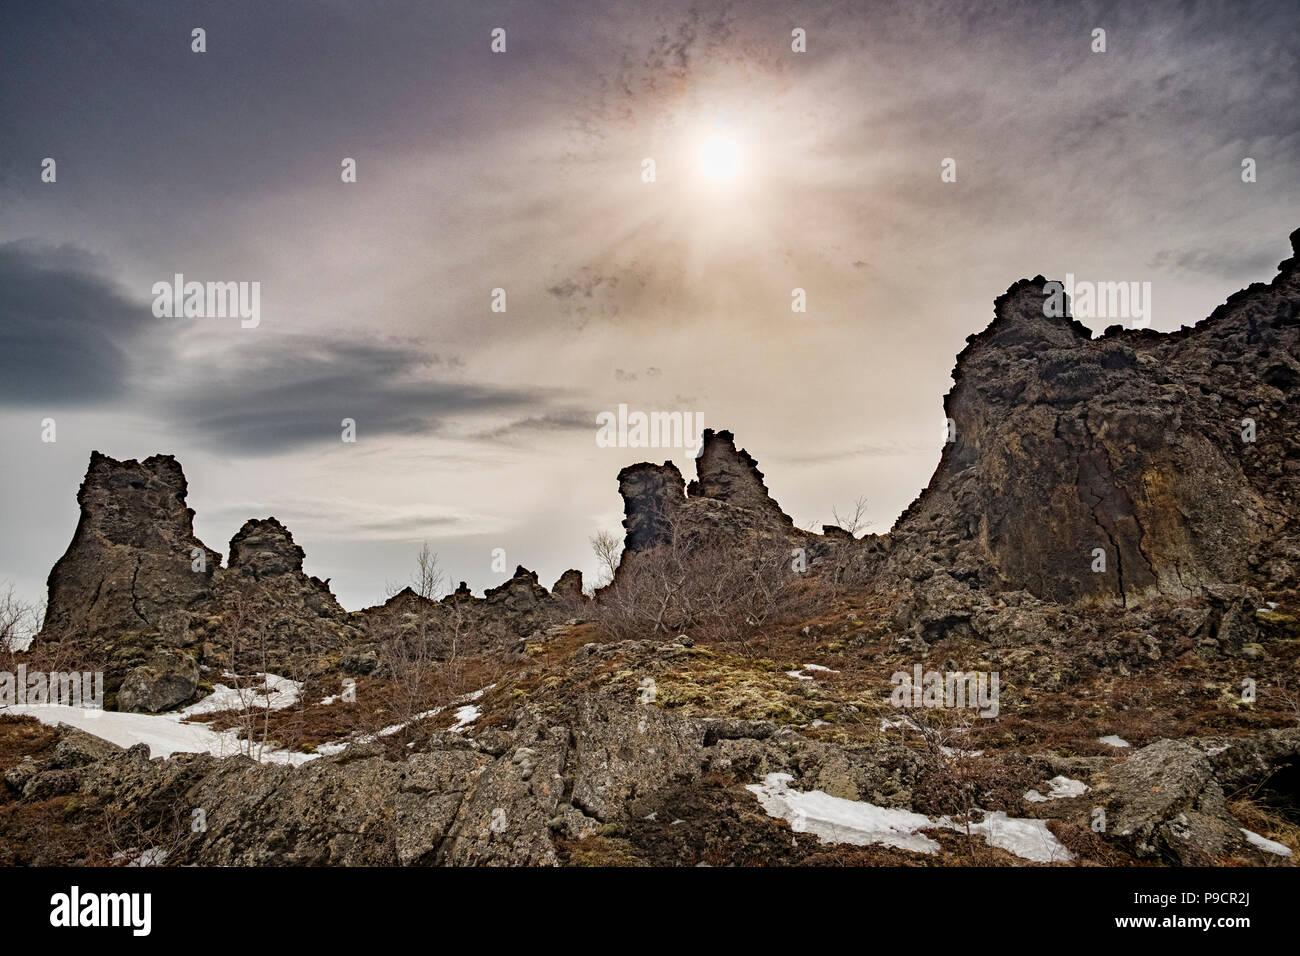 Lava outcrops at Dimmuborgir, near Lake Myvatn in northern Iceland. - Stock Image